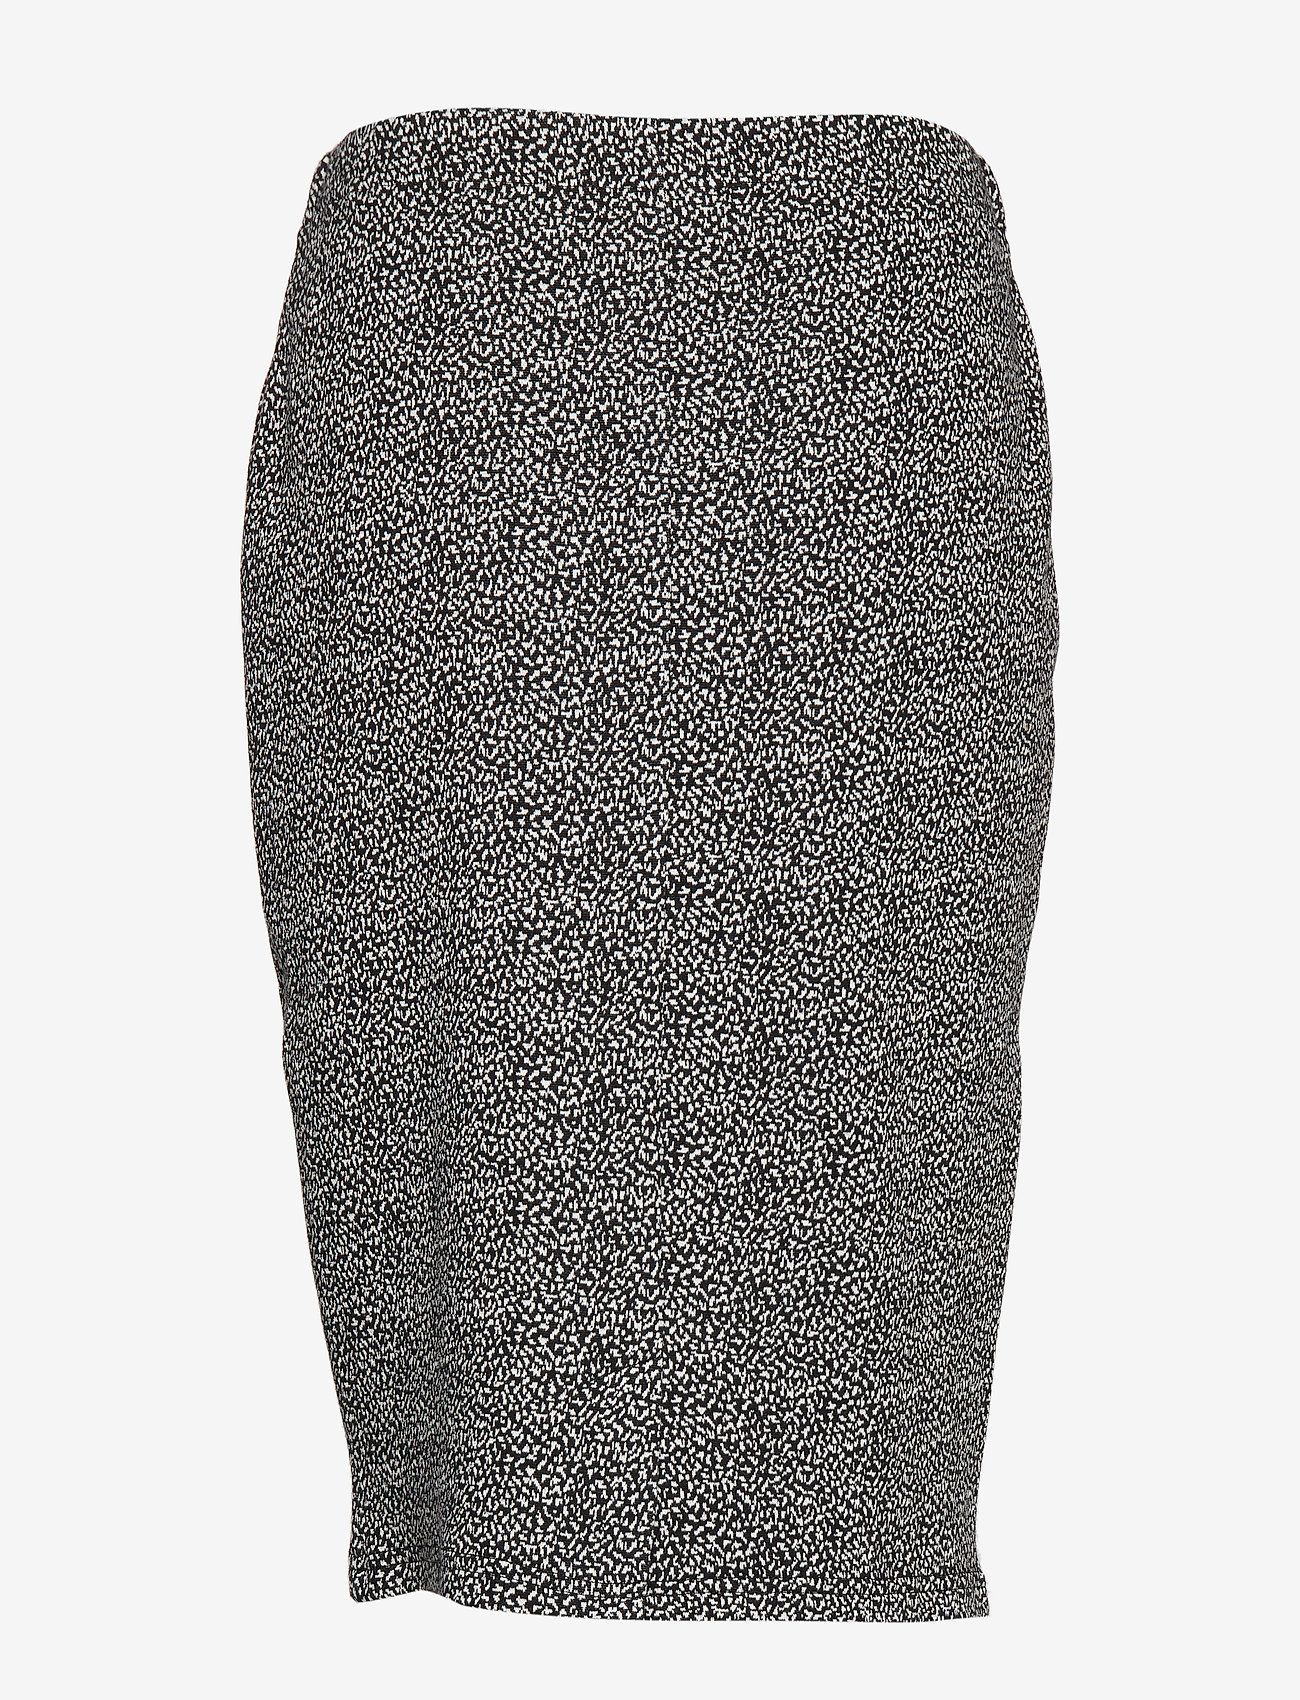 Skirt Medium Length Classic (Black/cream) (339.60 kr) - Betty Barclay